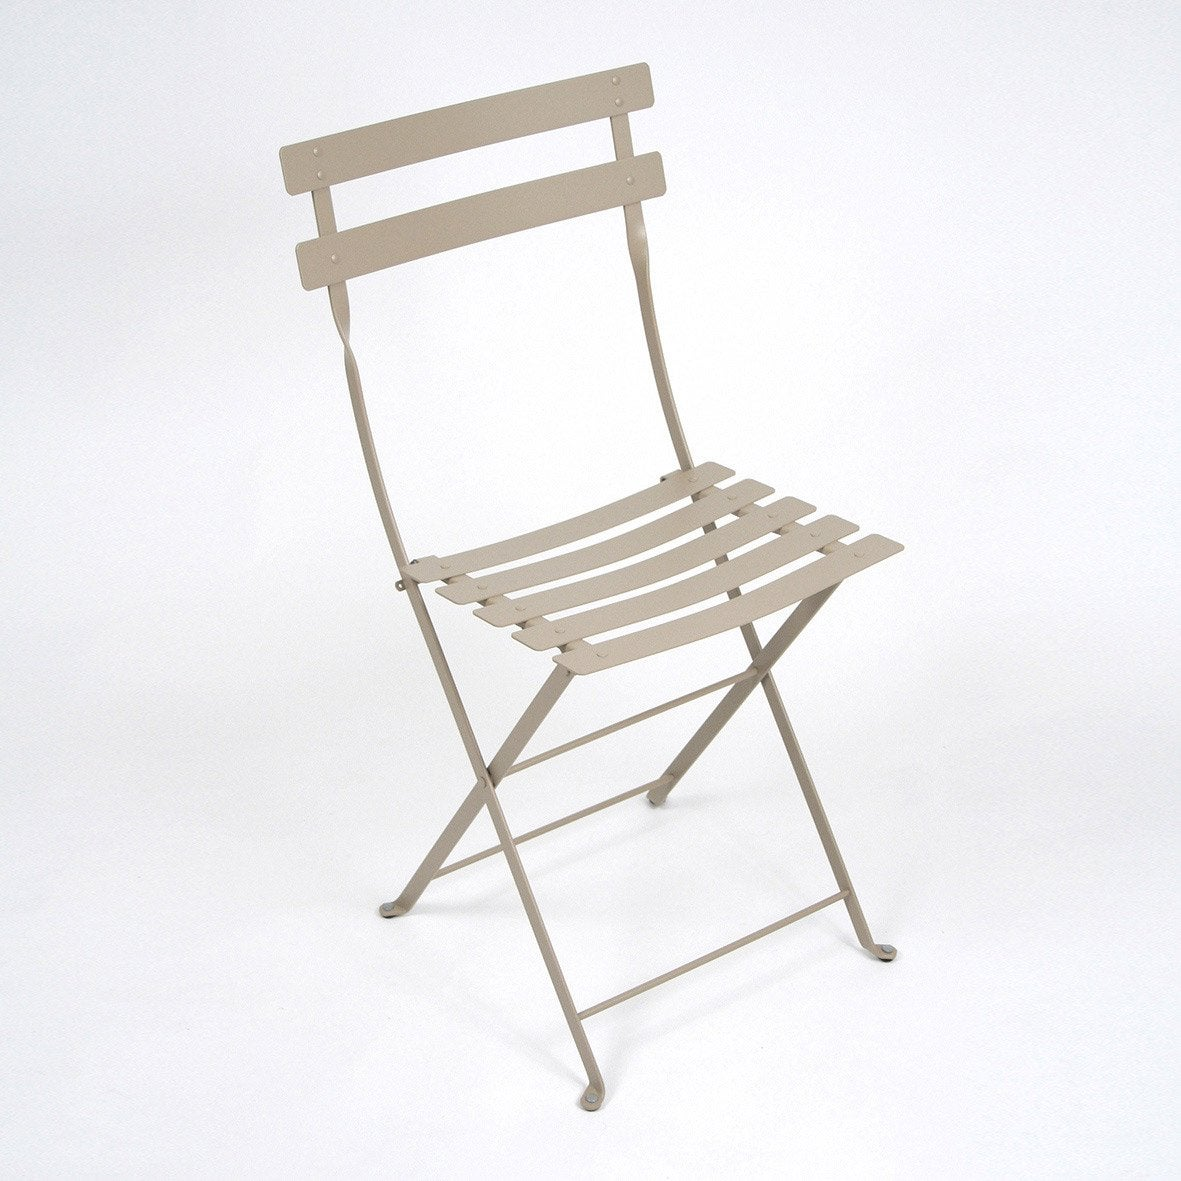 chaise de jardin en acier bistro muscade leroy merlin. Black Bedroom Furniture Sets. Home Design Ideas